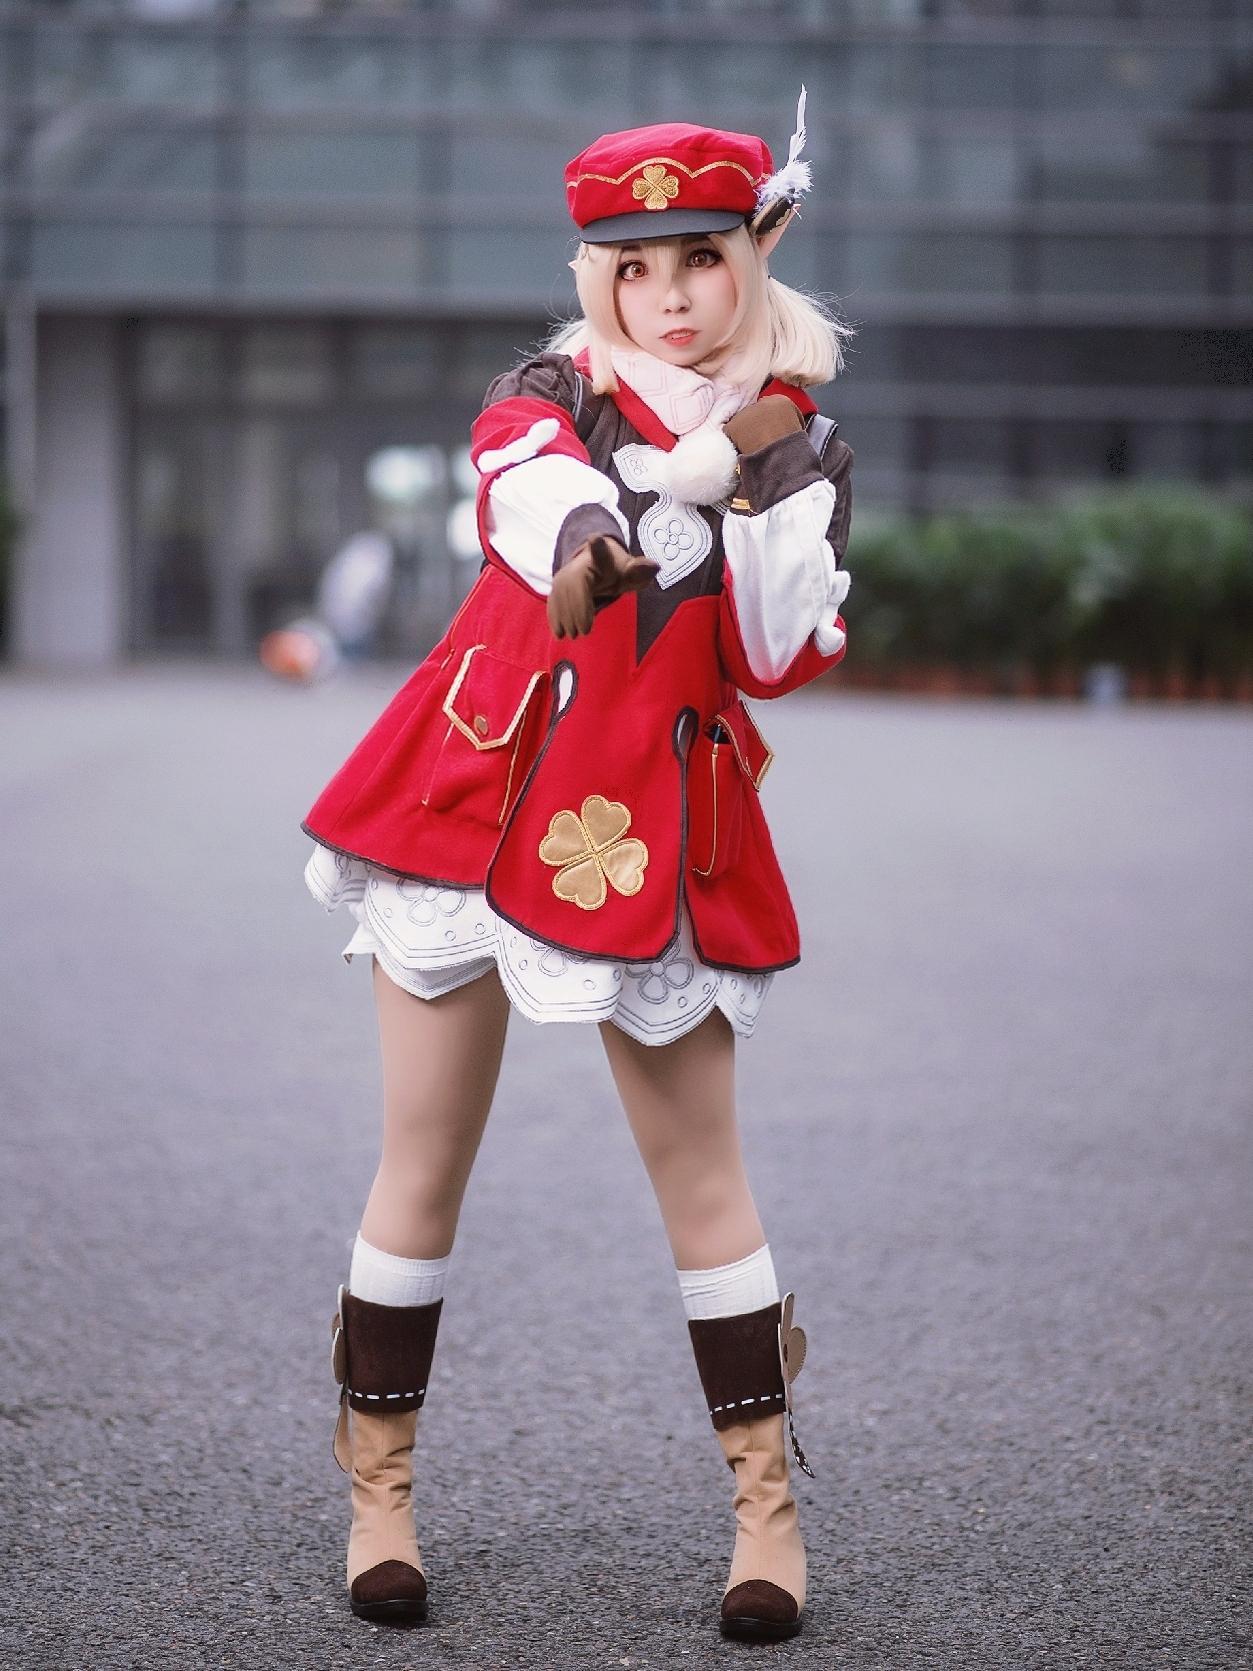 《原神》漫展cosplay【CN:得萨】-第1张